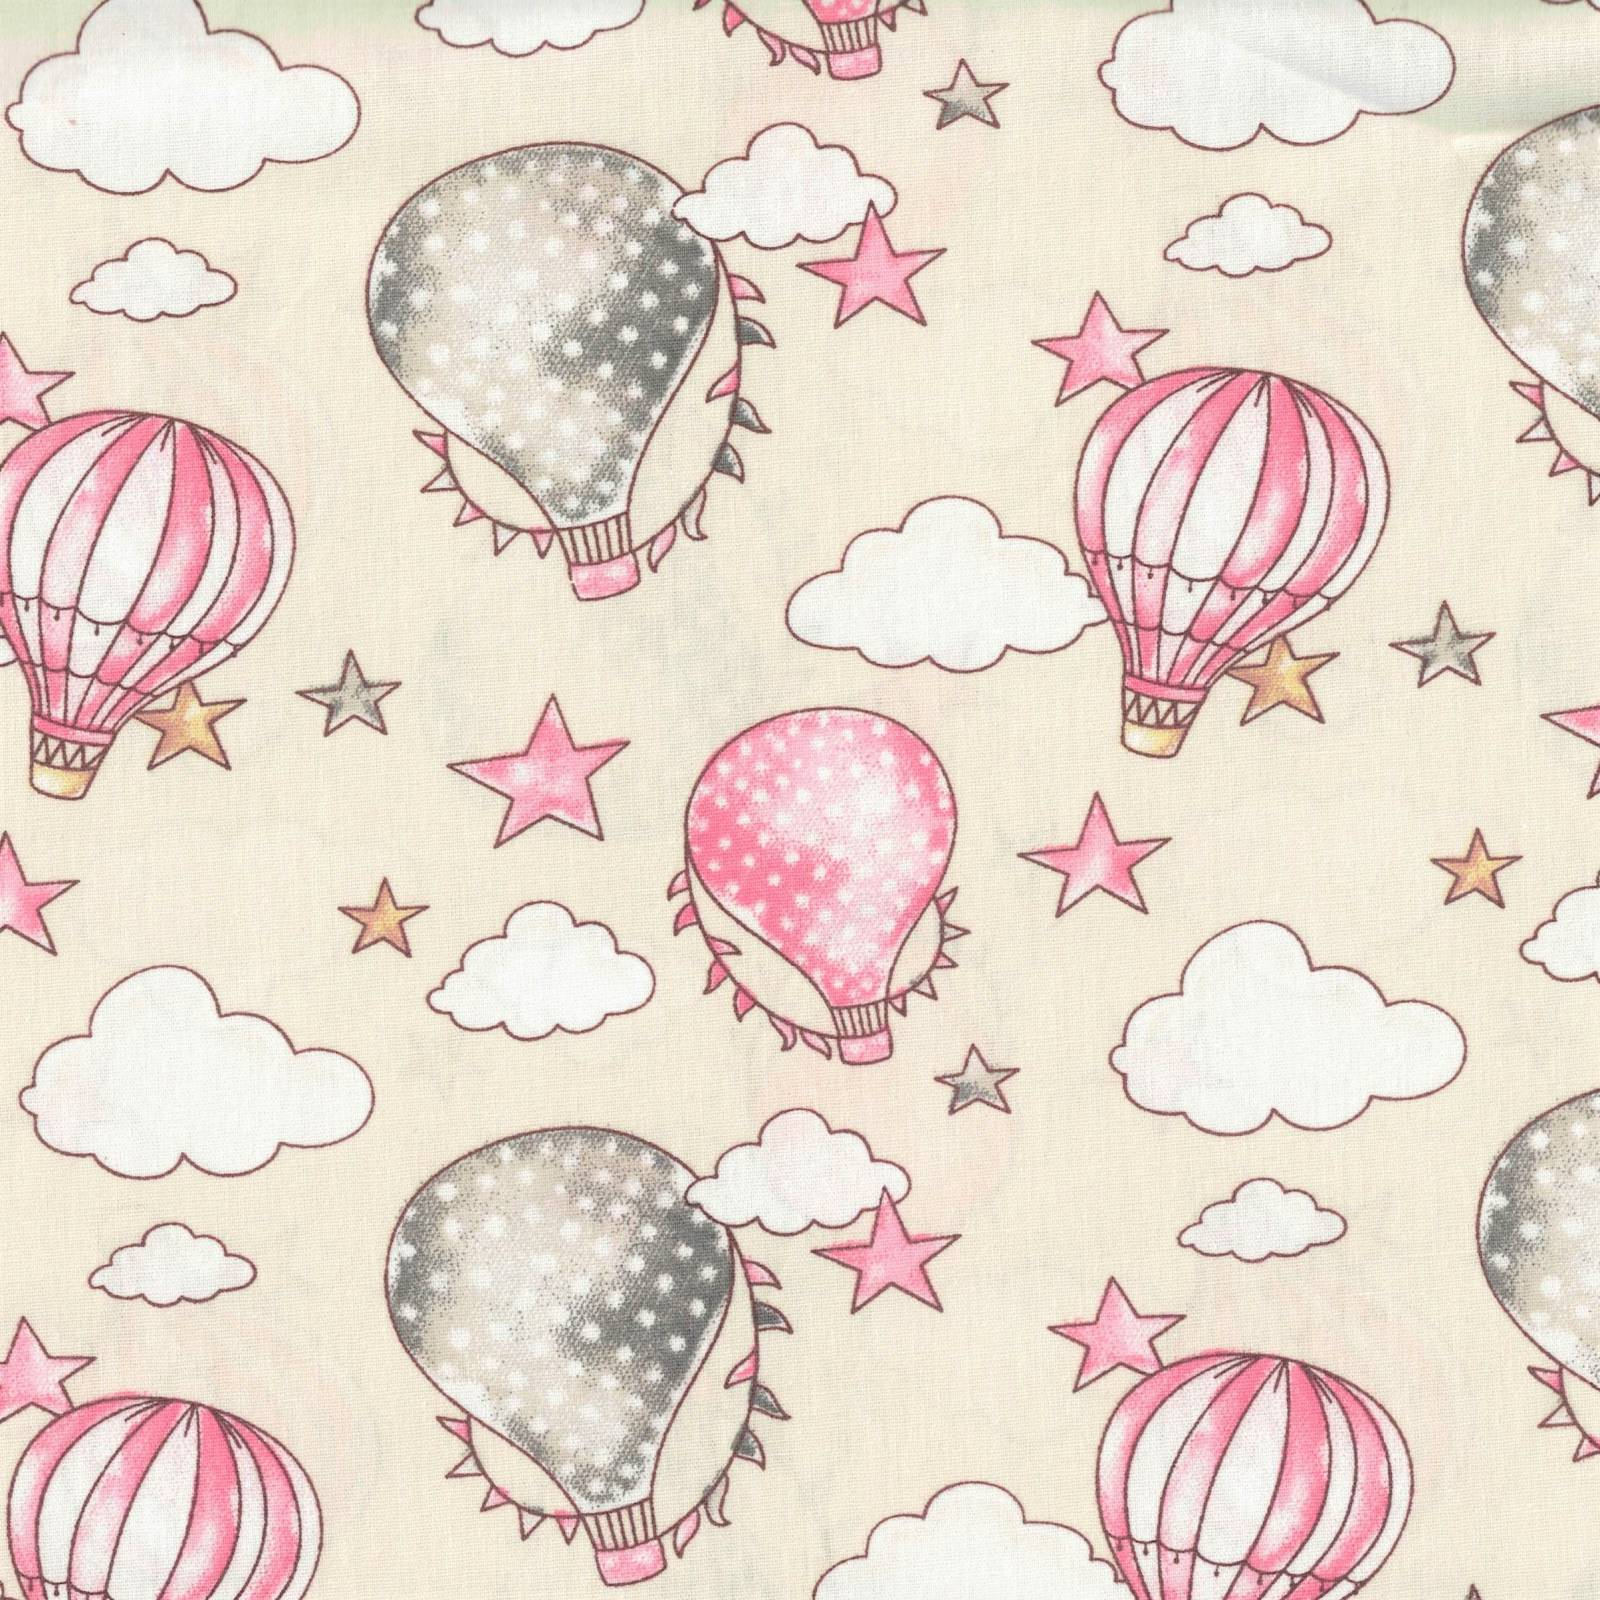 Balloon Bege com Rosa Ref. 180636 cor 01 Caldeira - Armarinhos Nodari